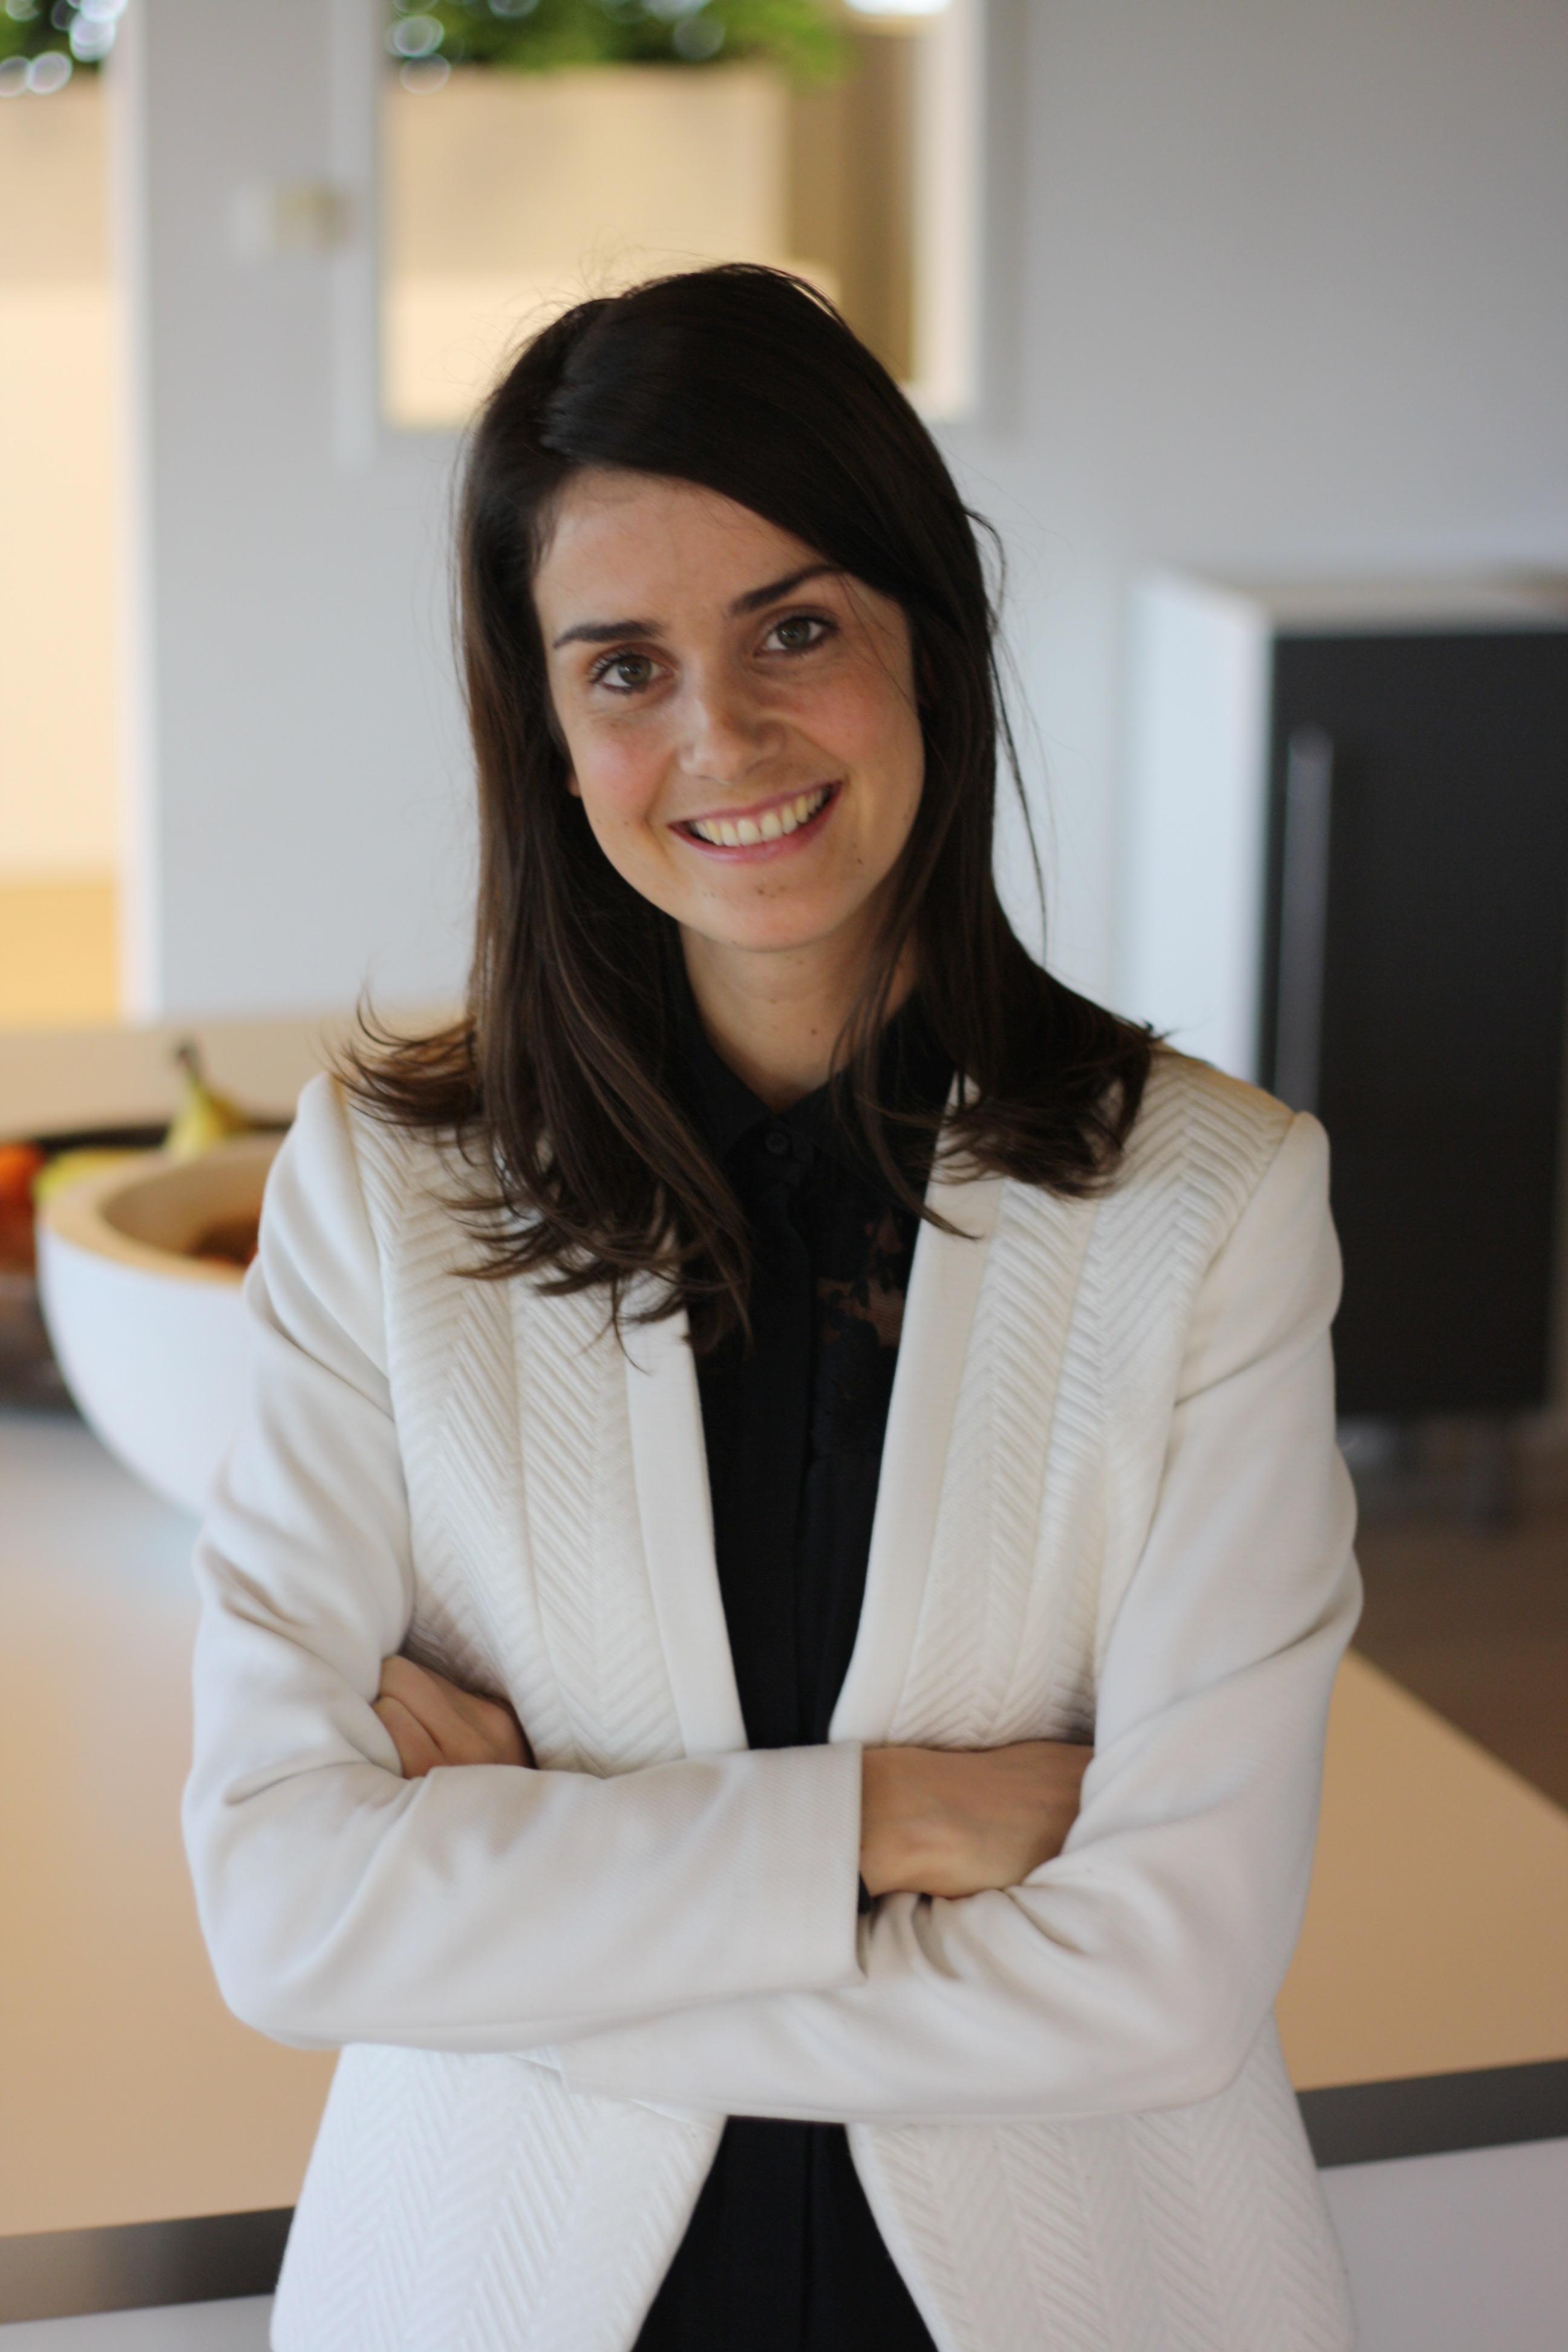 Elles van den Berg avatar